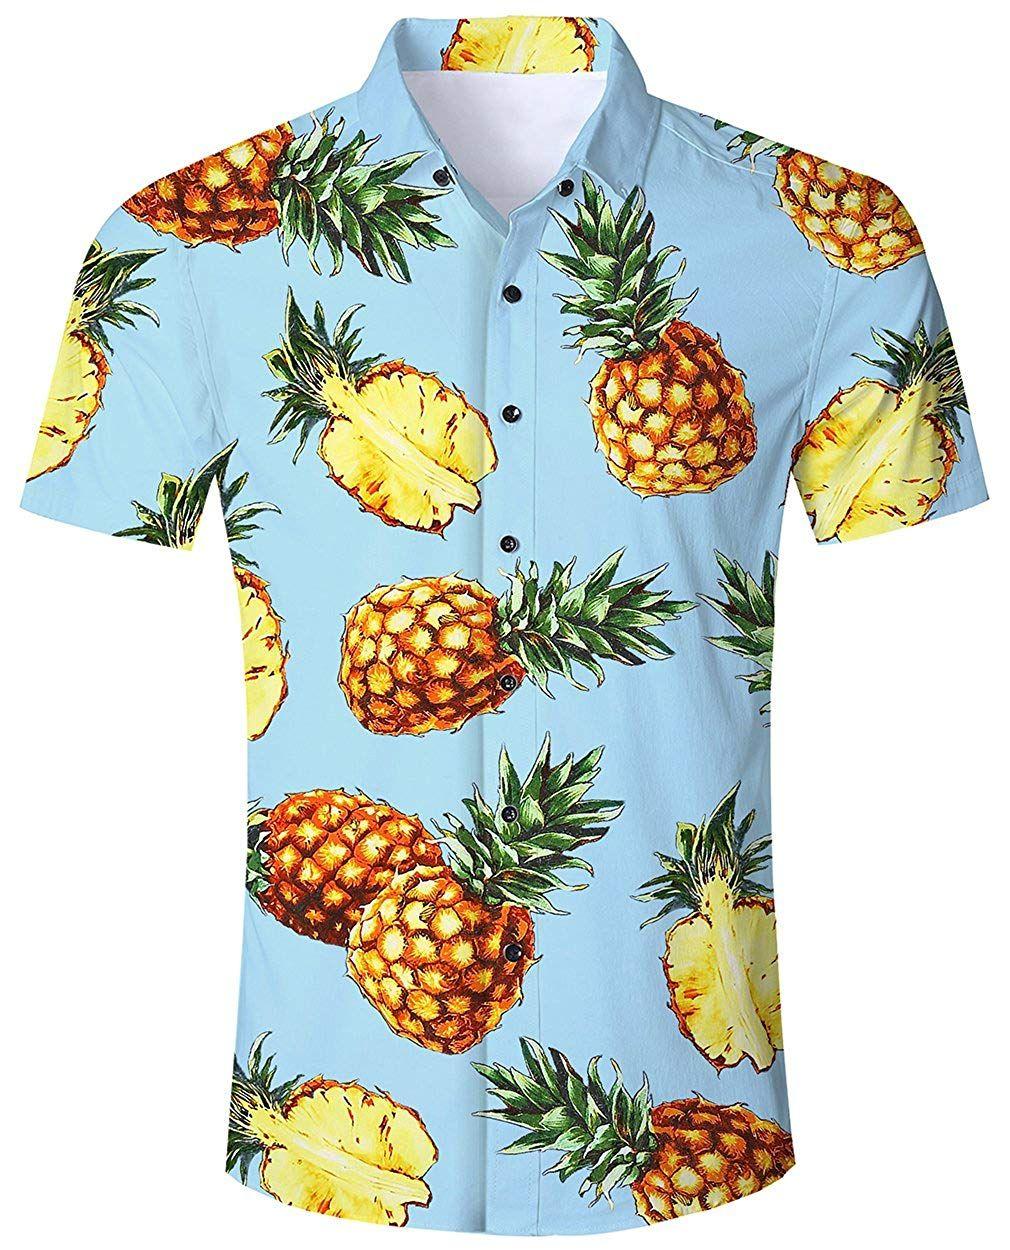 Camisa Hawaiana Para Hombre Mujer Casual Manga Corta Camisas Playa Verano Unisex 3d Estampada Funny Hawaii Disfraceslandia Camisa Hawaiana Camisas Ropa Informal Masculina